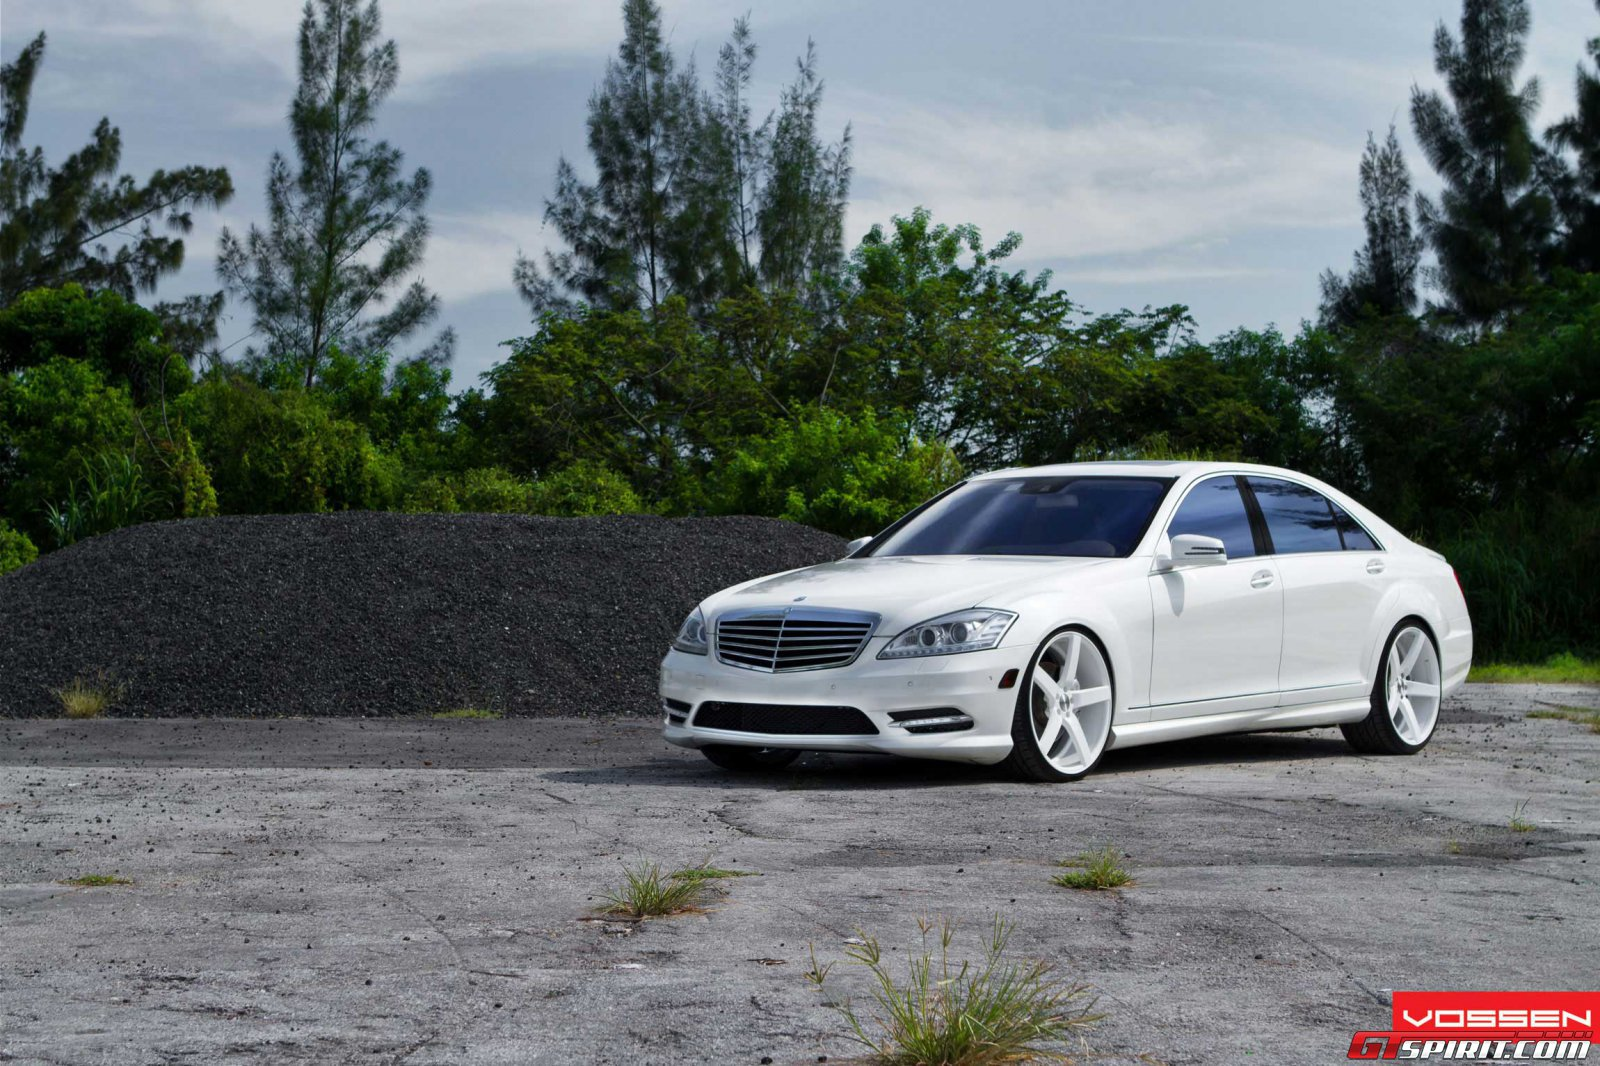 Mercedes benz s550 22 inch rims for Mercedes benz s class rims